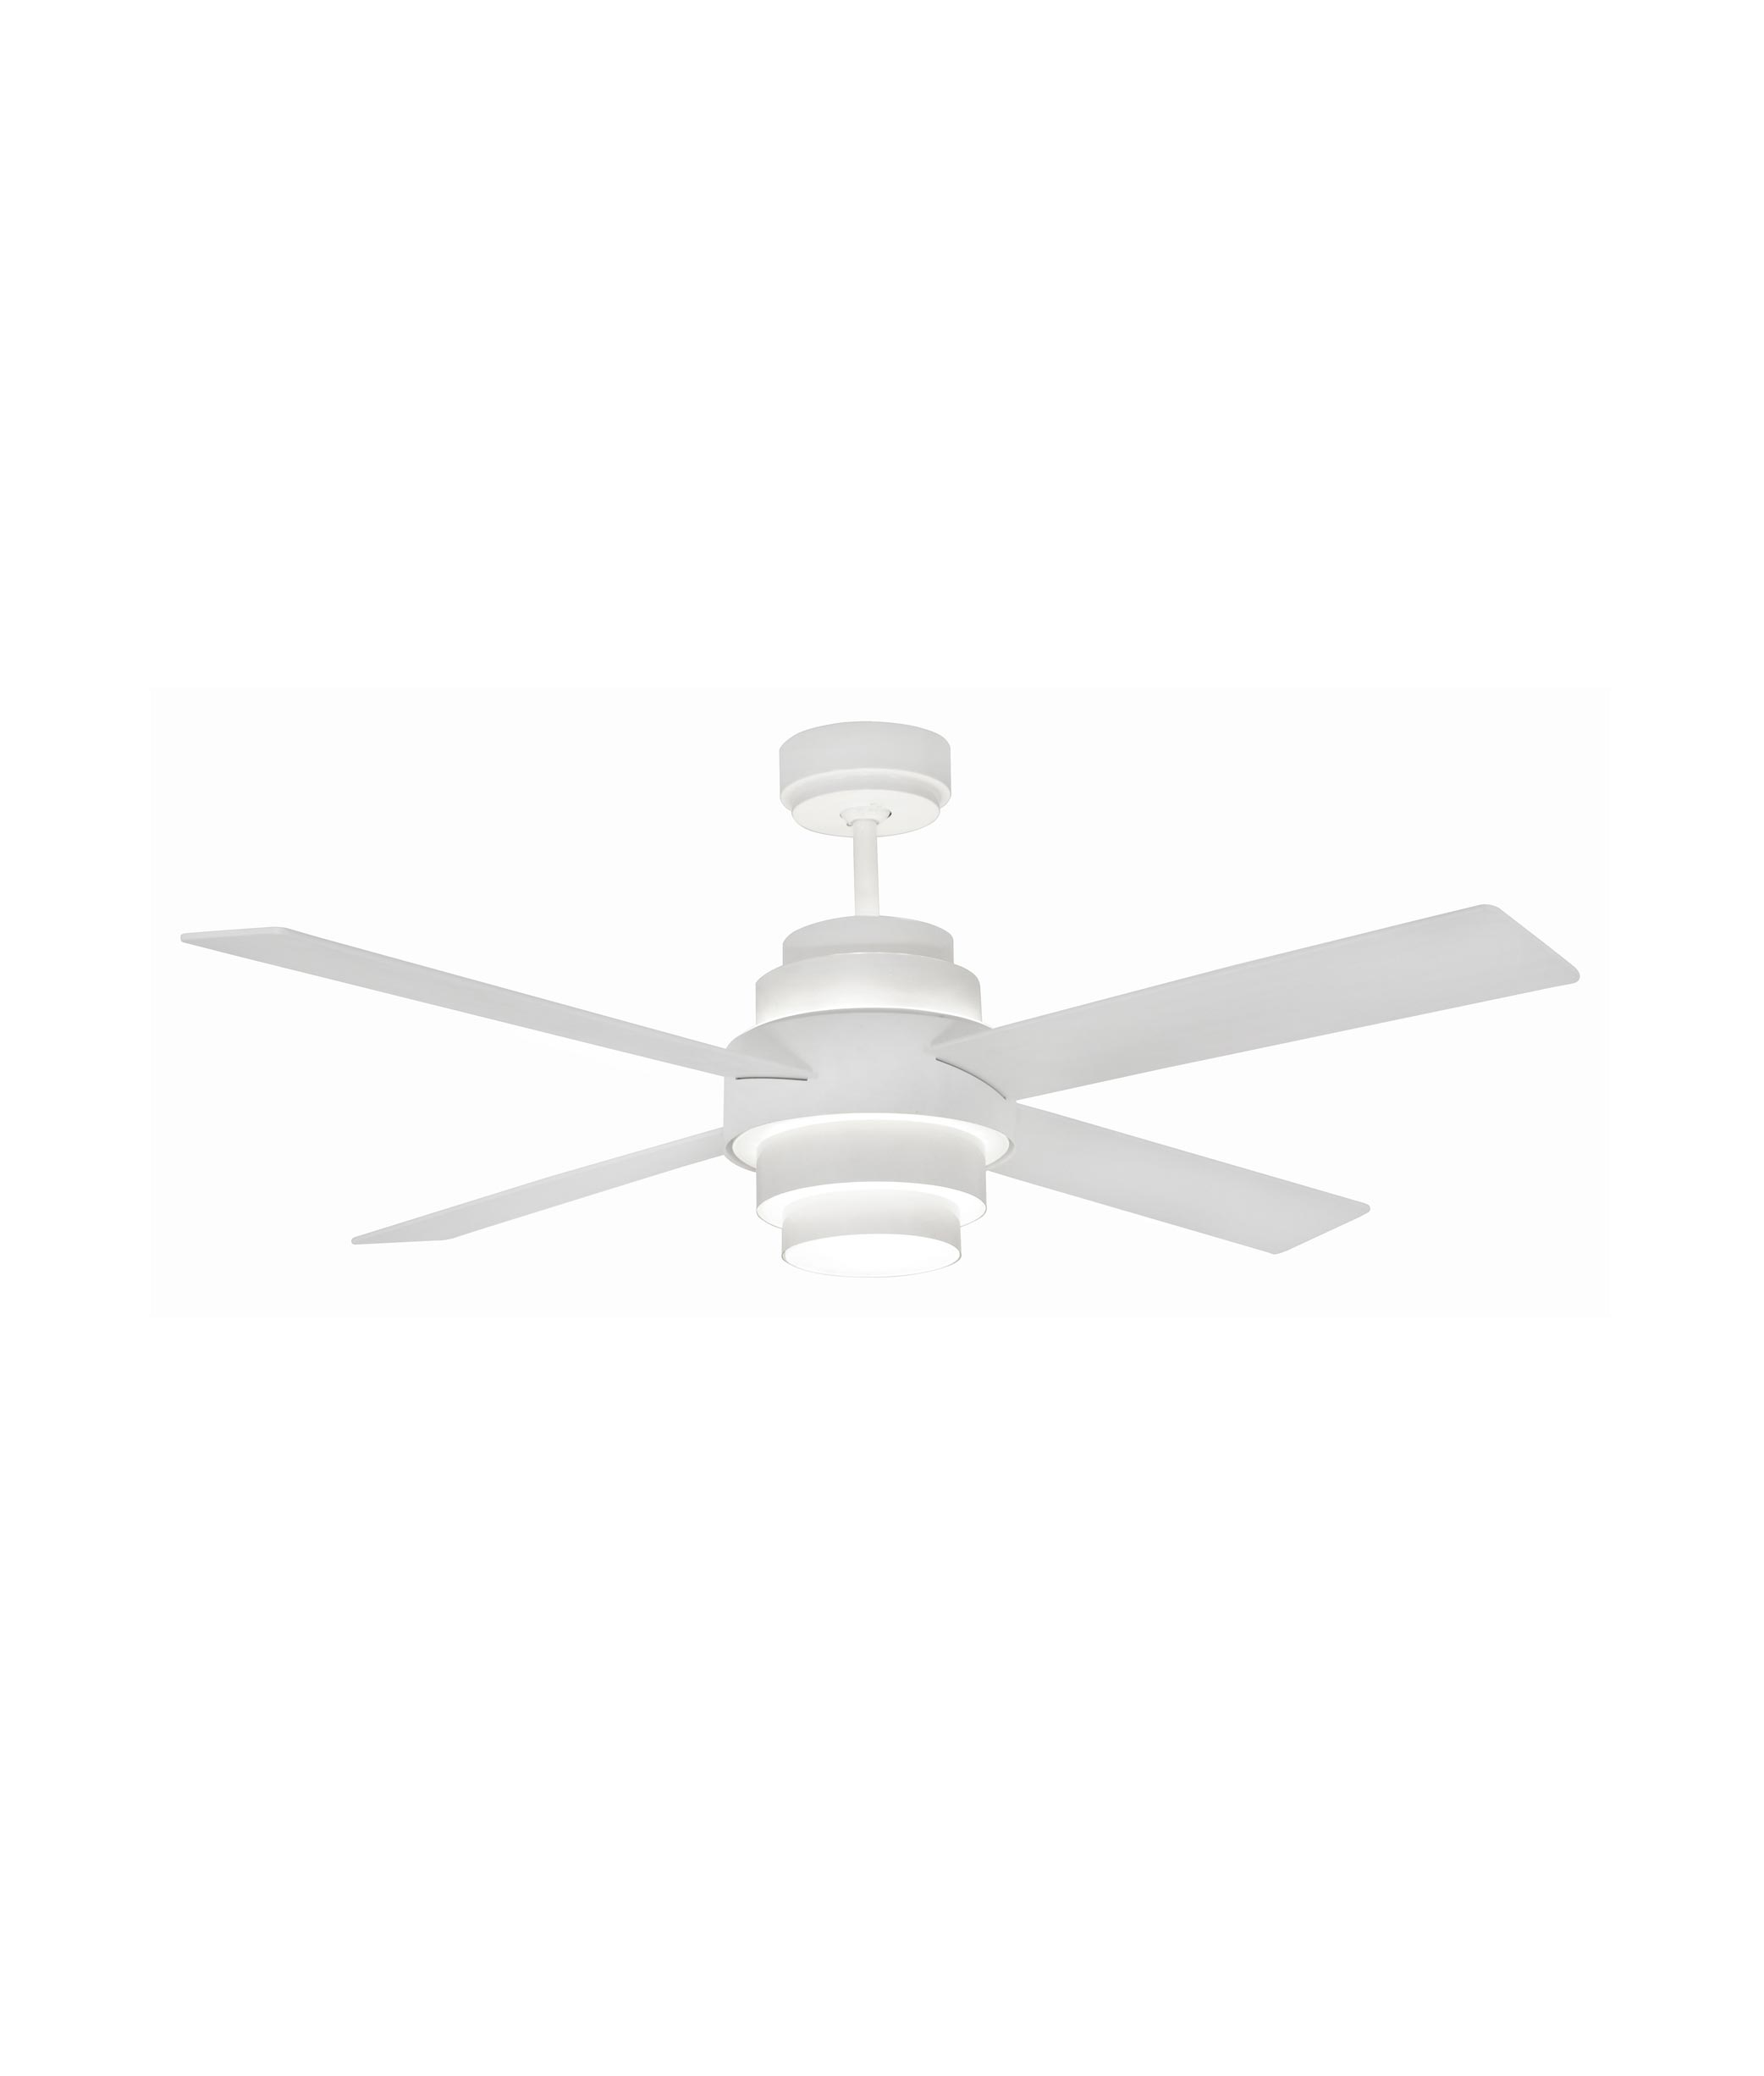 Ventilador blanco DISC FAN LED iluminado